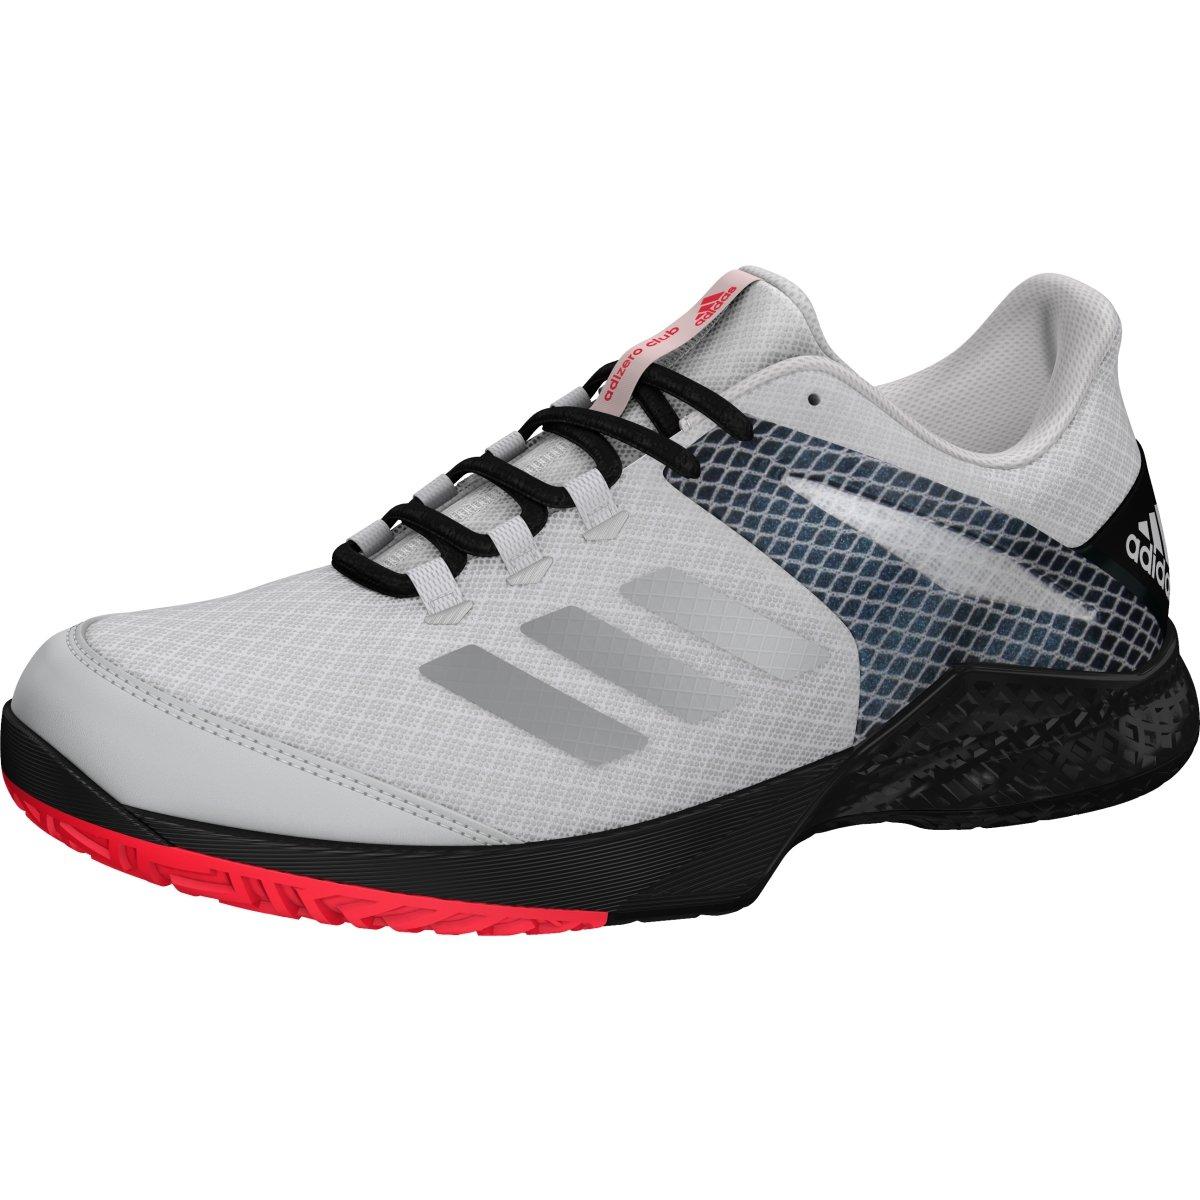 adidas Adizero Club 2 Shoe Unisex Tennis 5 White-Matte Silver-Black